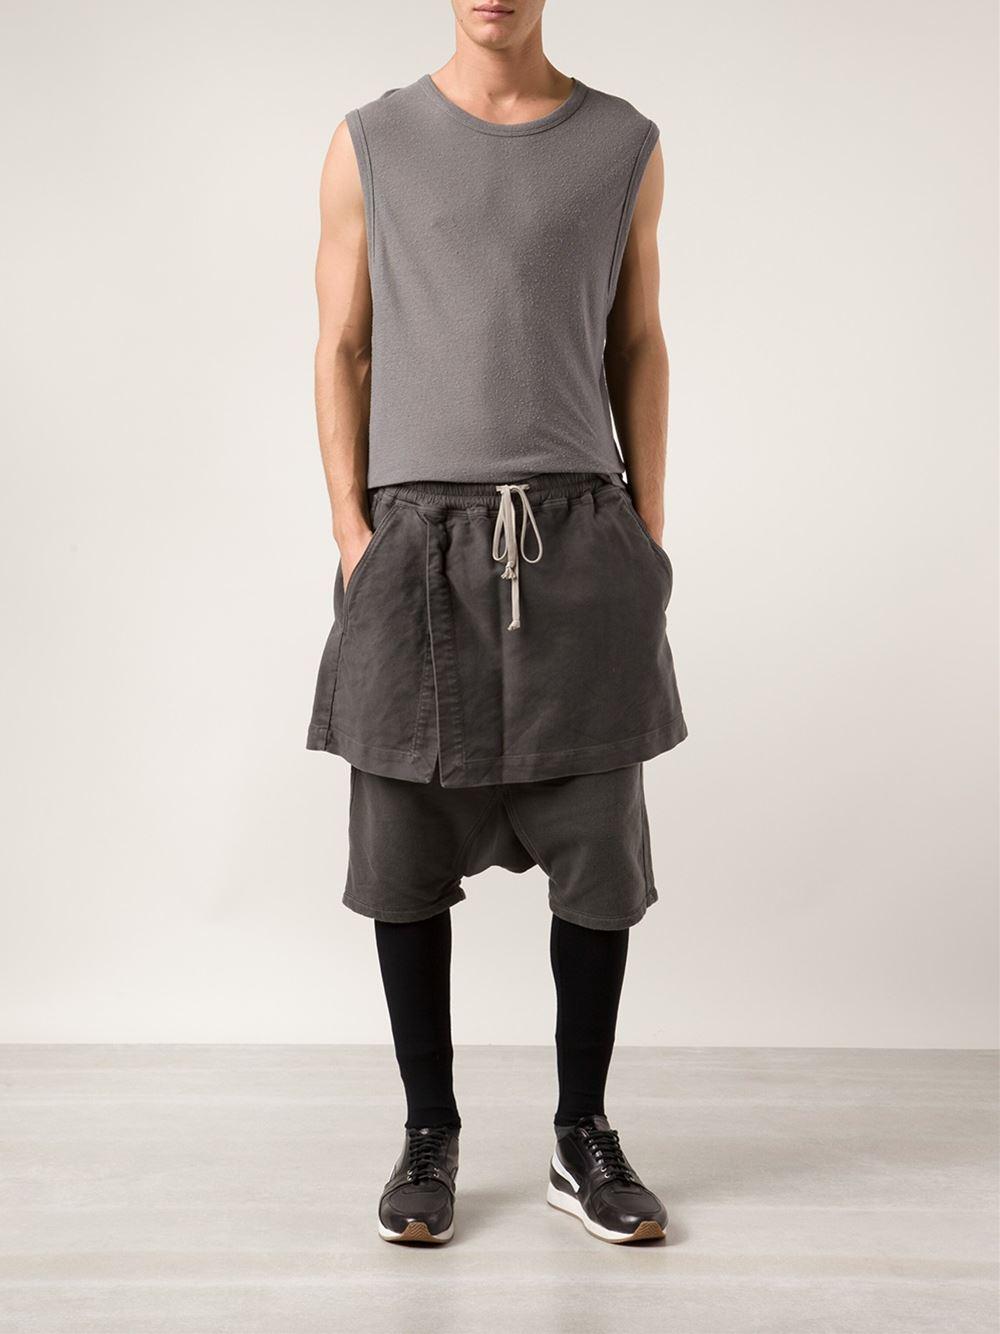 Lyst Drkshdw By Rick Owens Skirt Shorts In Gray For Men